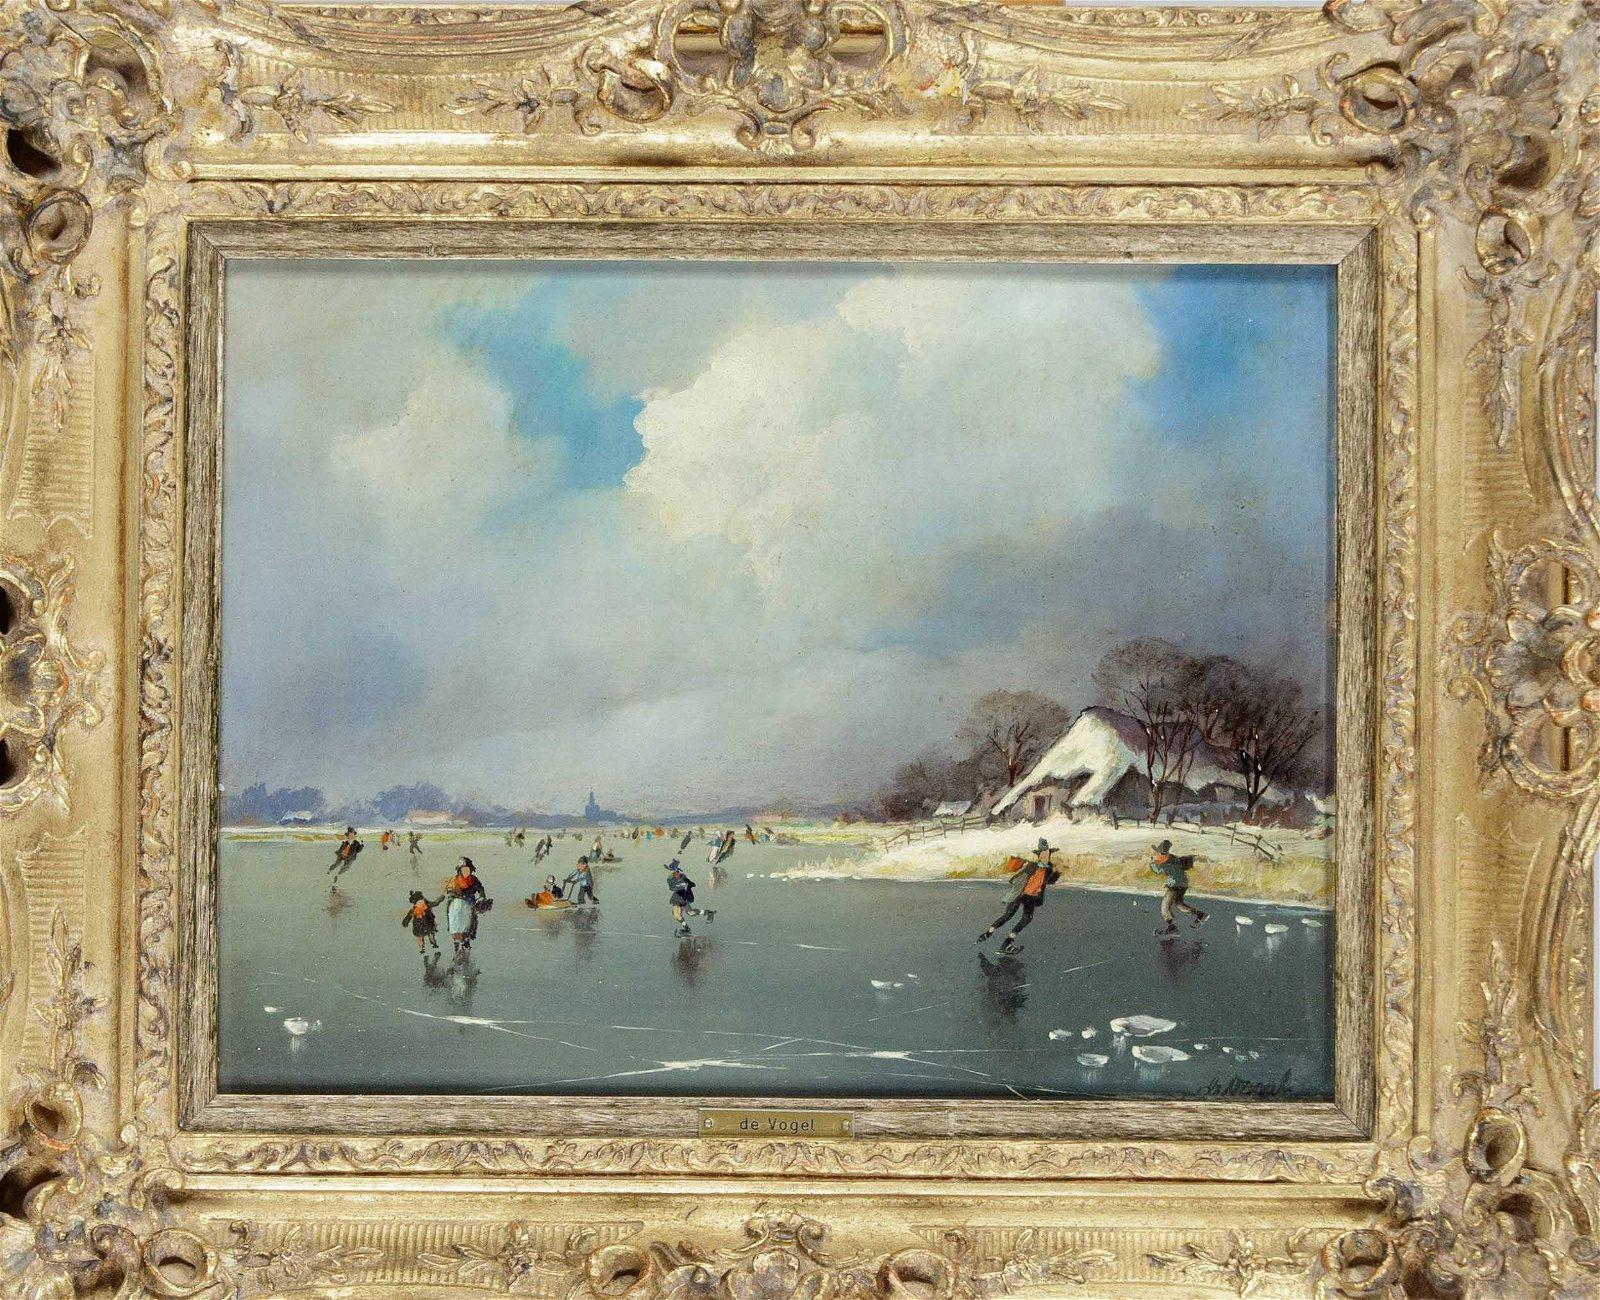 Louis de Vogel, Belgian painte